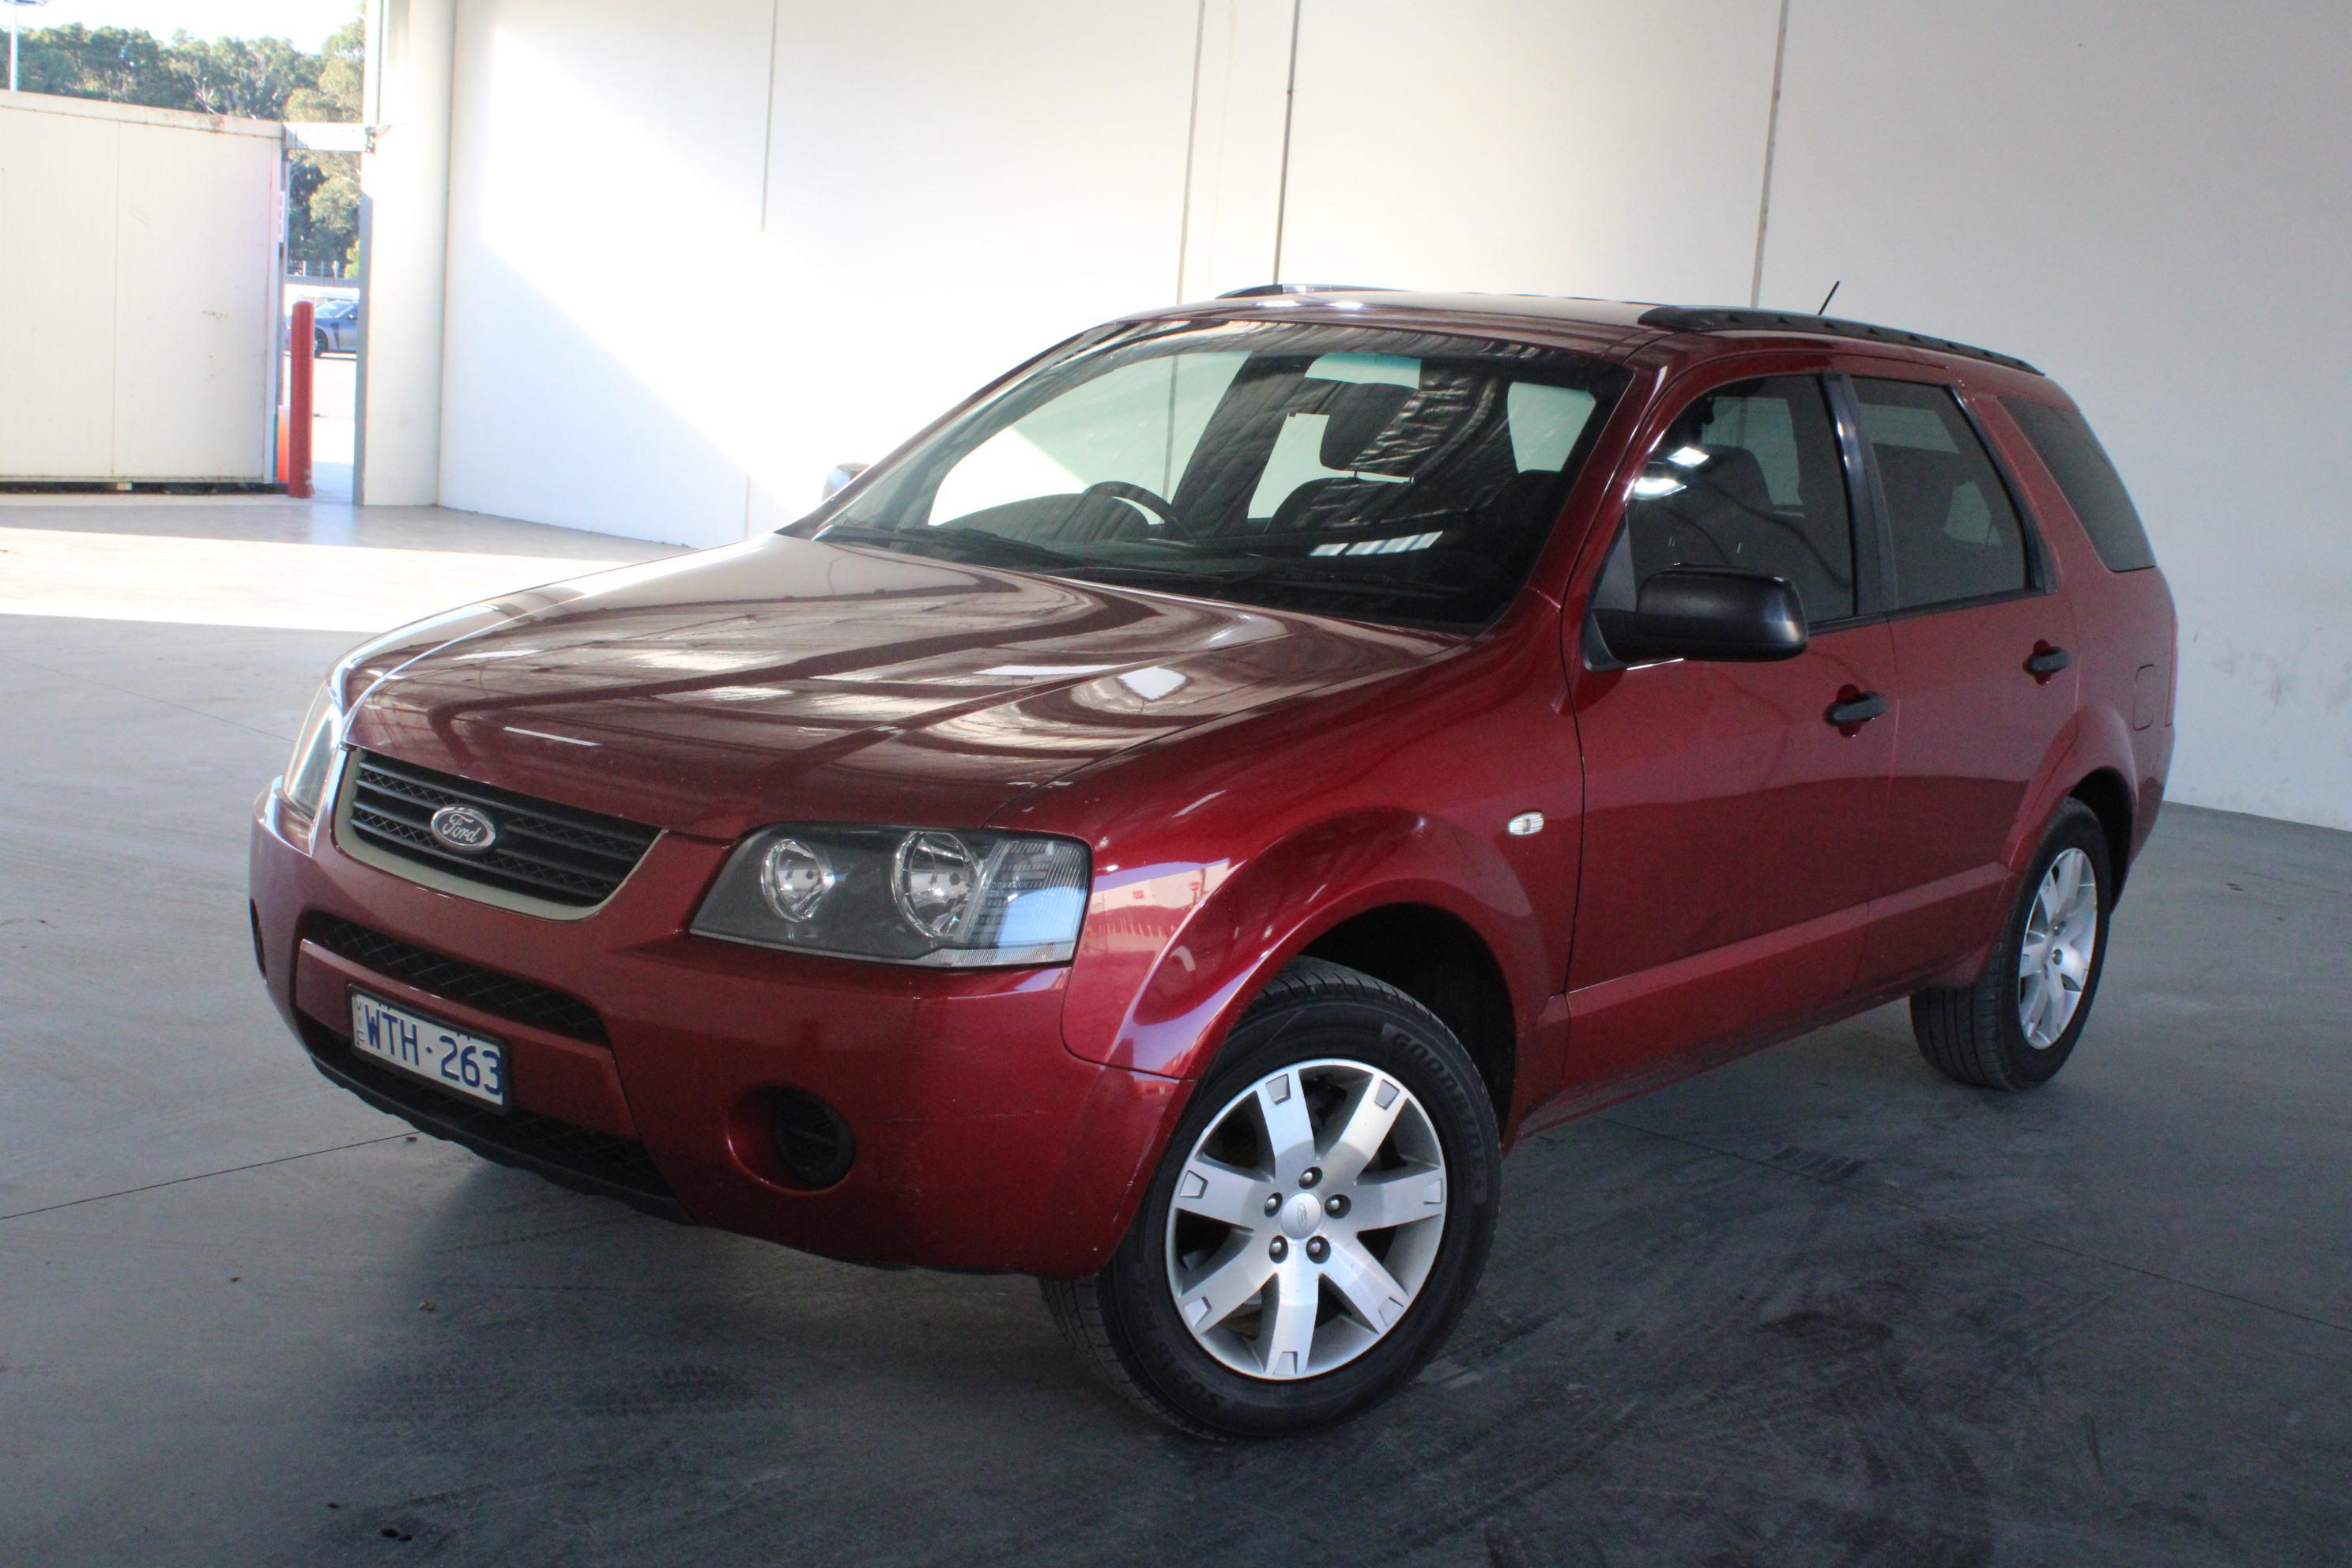 2008 Ford Territory (RWD) SR2 Automatic Wagon